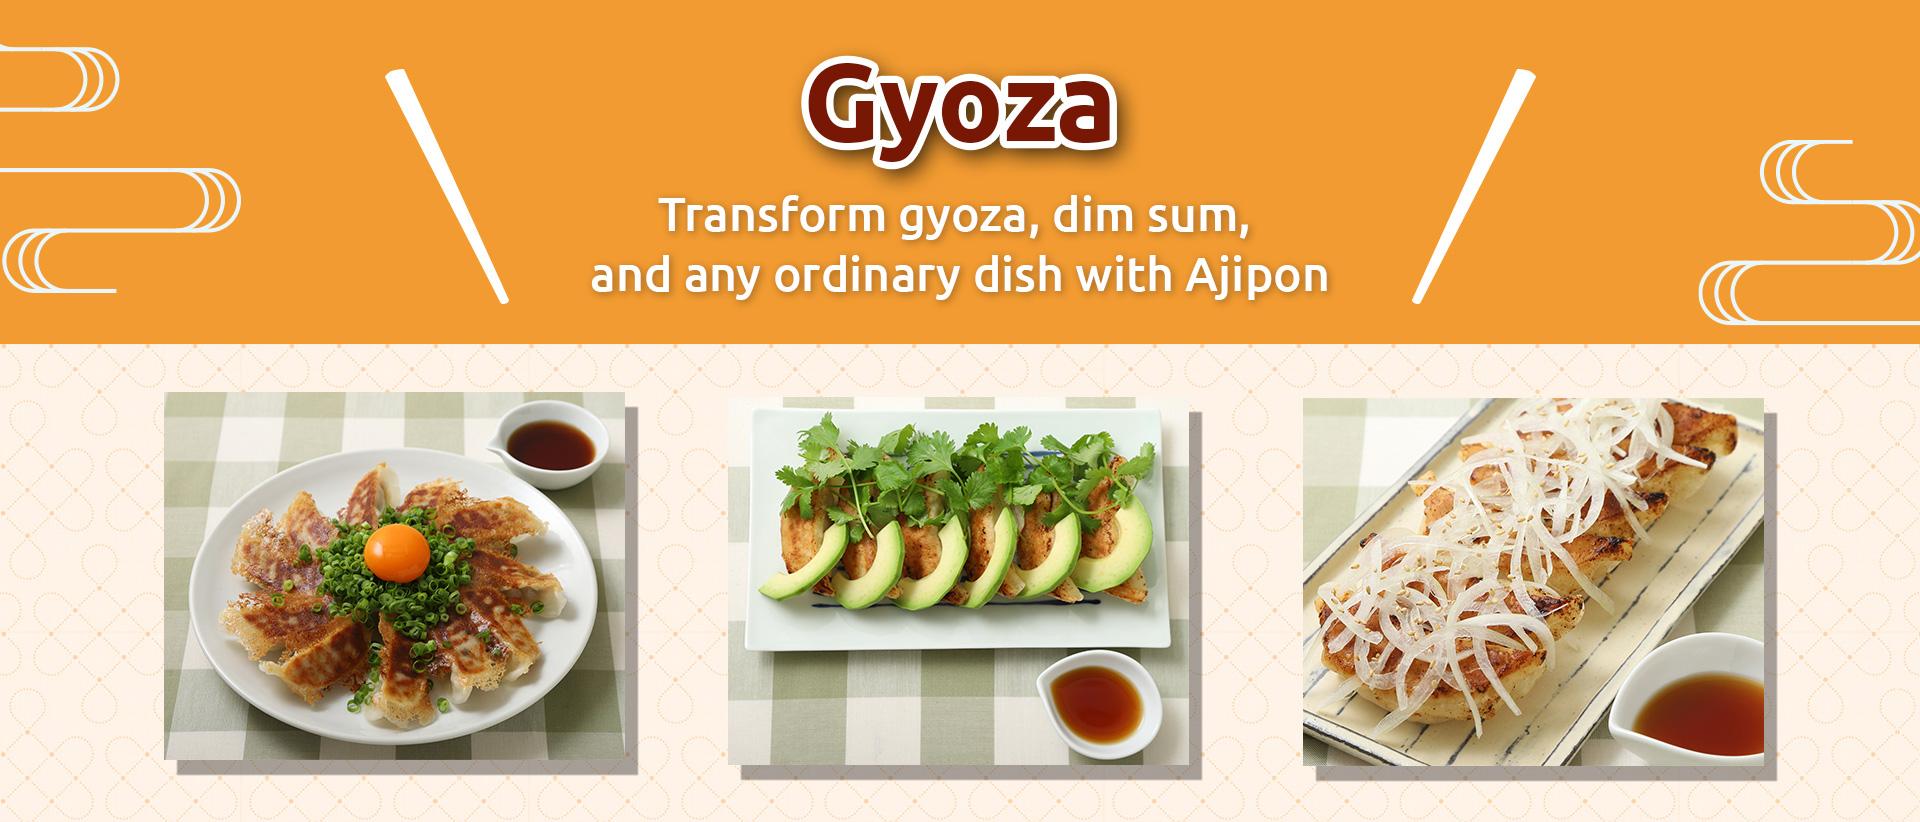 Gyoza - Transform gyoza, dim sum, and any ordinary dish with AJIPON!